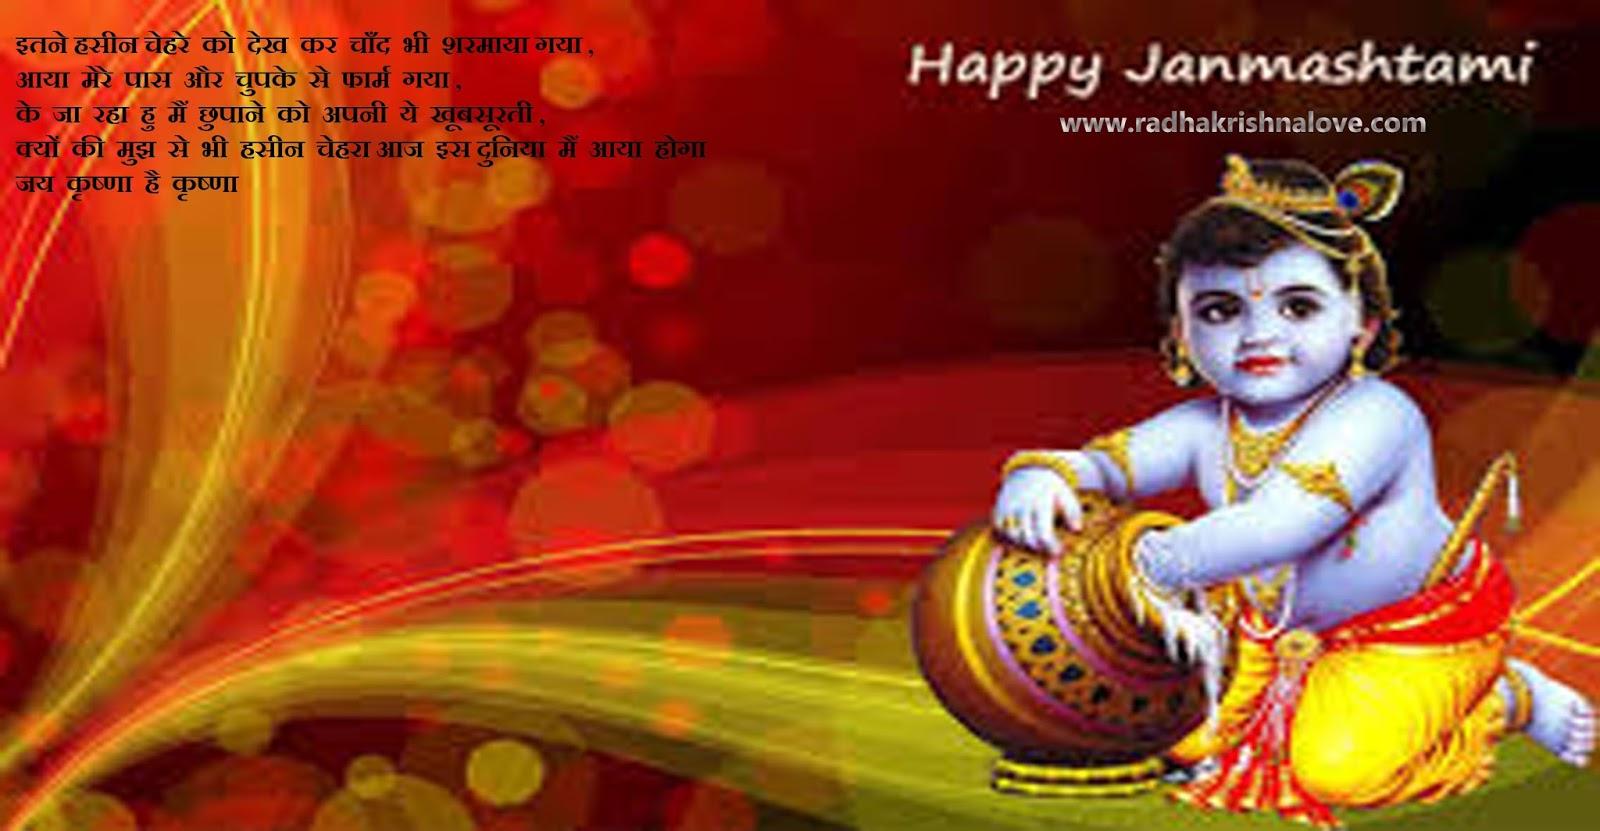 Radha Krishna Janmashtami Wallpapers